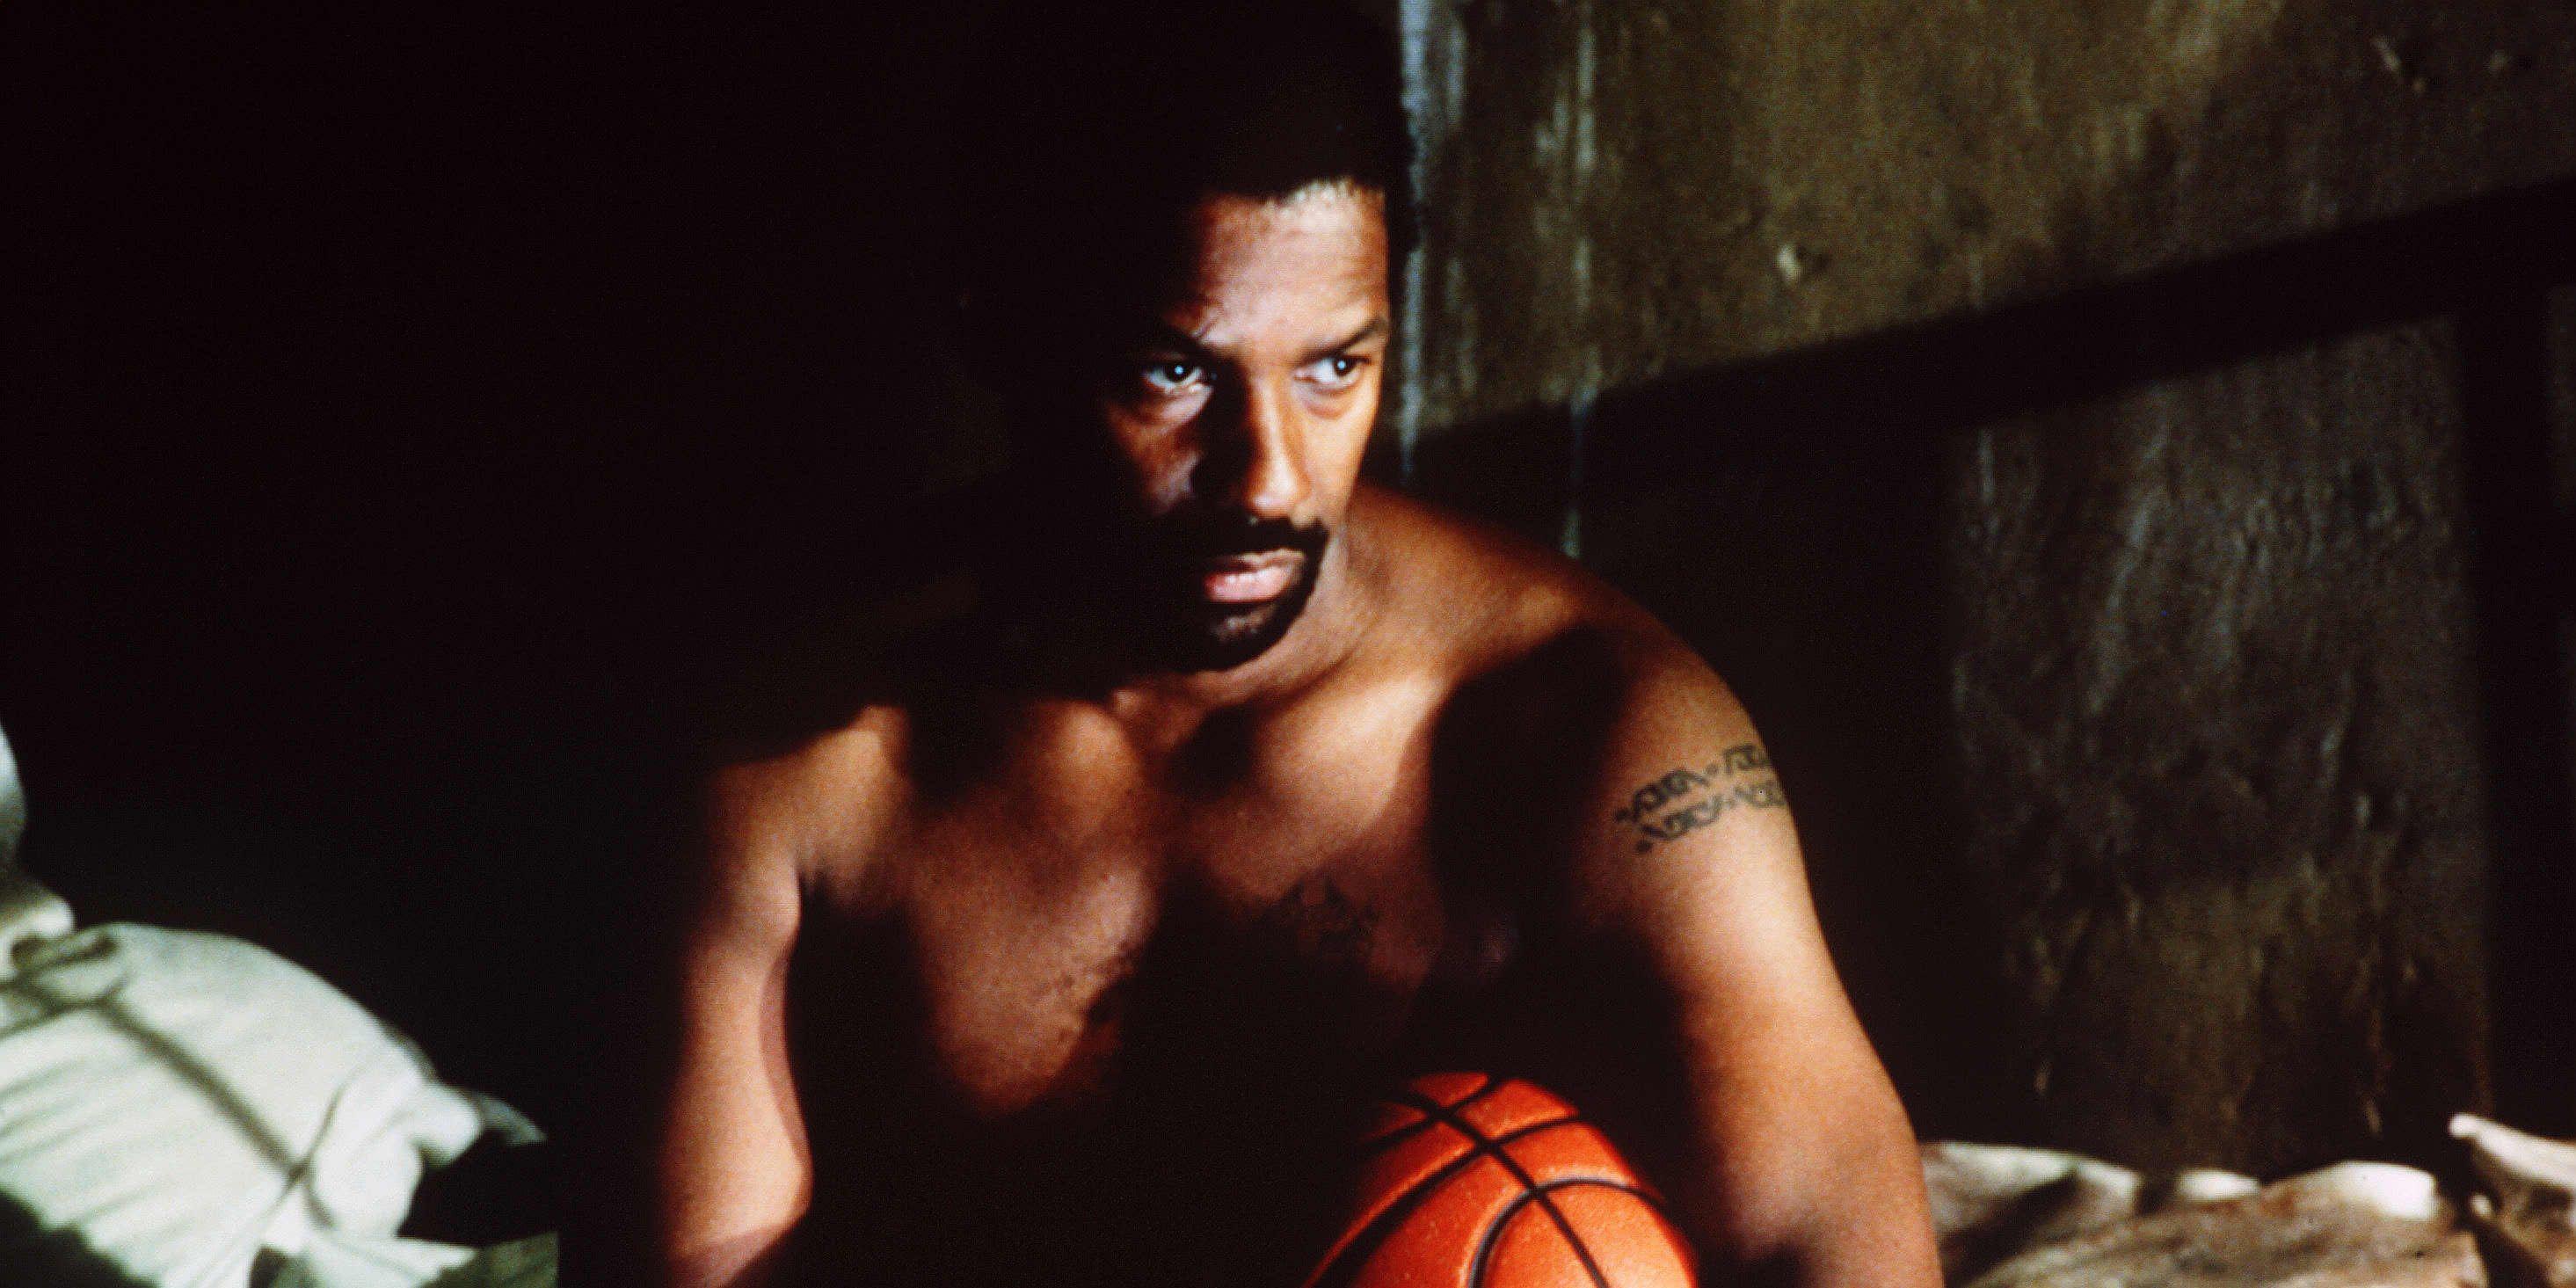 Denzel Washington Profile by Novelist John Edgar Wideman Ahead of Spike Lee's 'He Got Game'